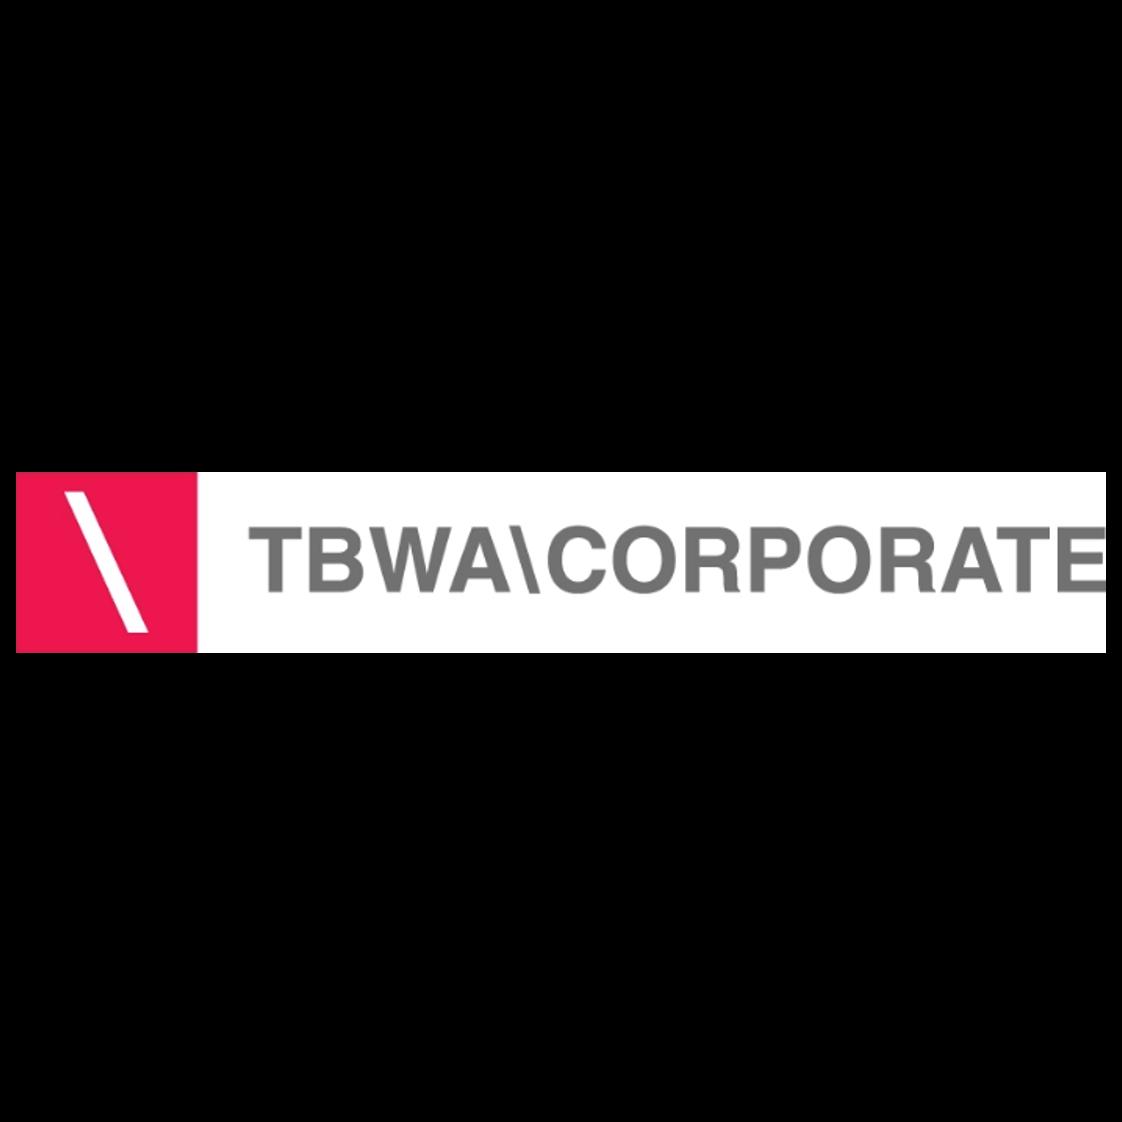 TBWA CORPORATE